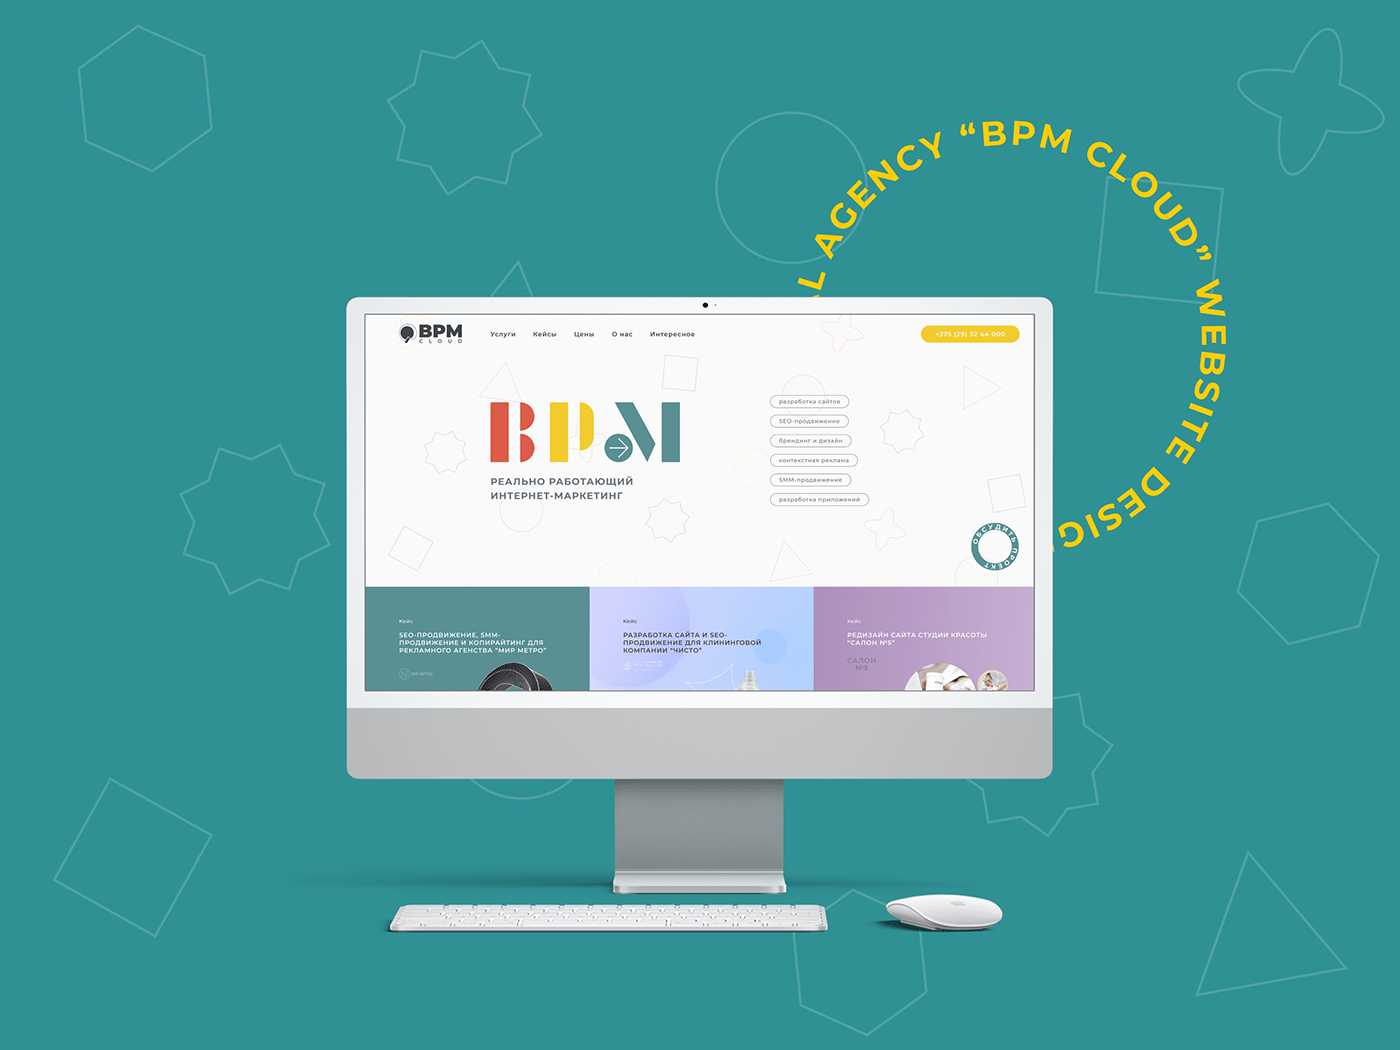 Figma ui design UI/UX Web Design  Webdesign Website веб-дизайн дизайн дизайн сайта сайт